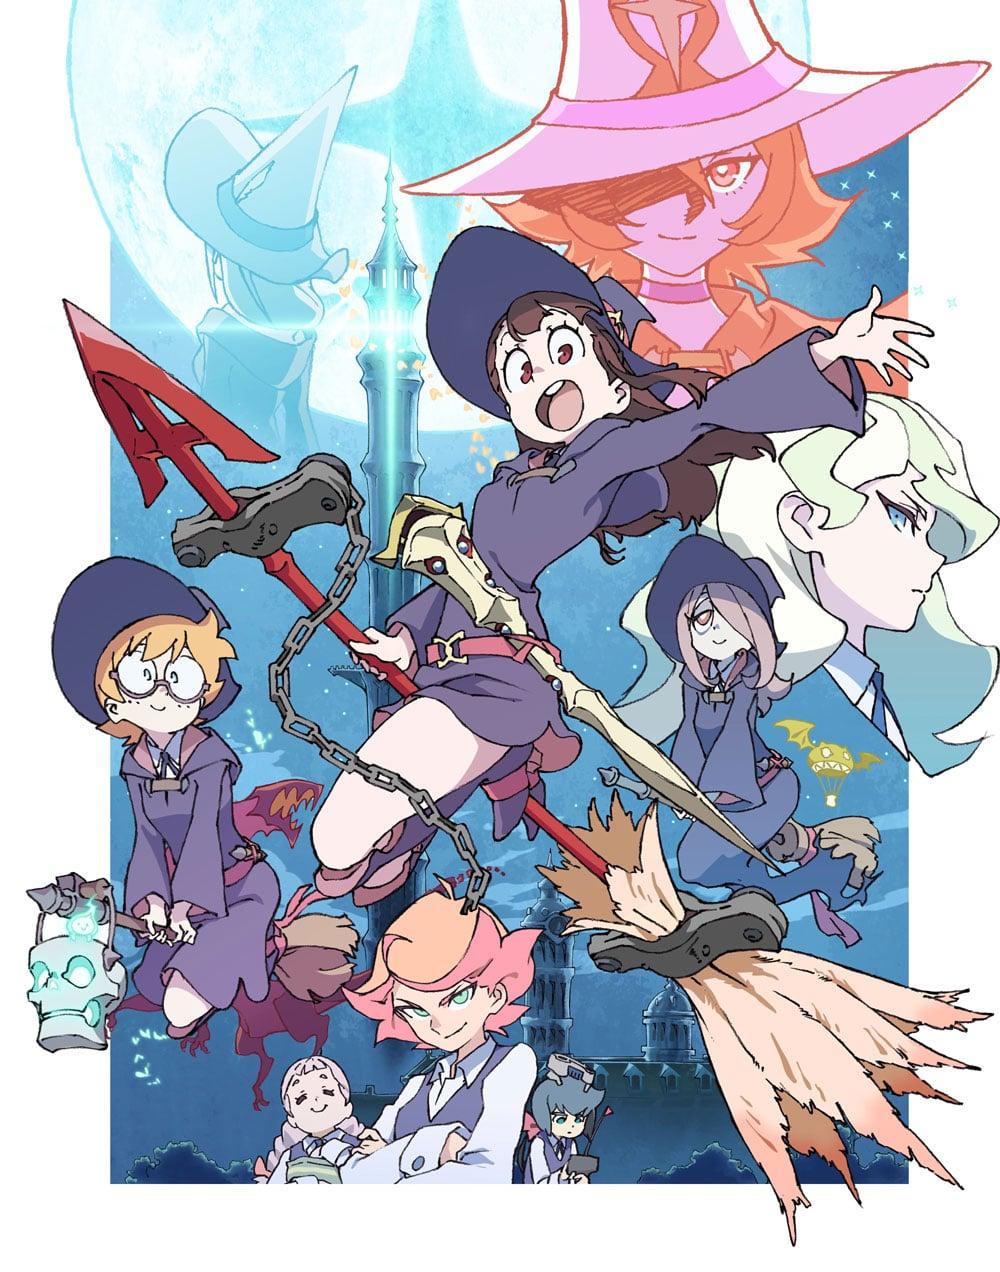 TVアニメ「リトルウィッチアカデミア」Vol.8 DVD 初回生産限定版